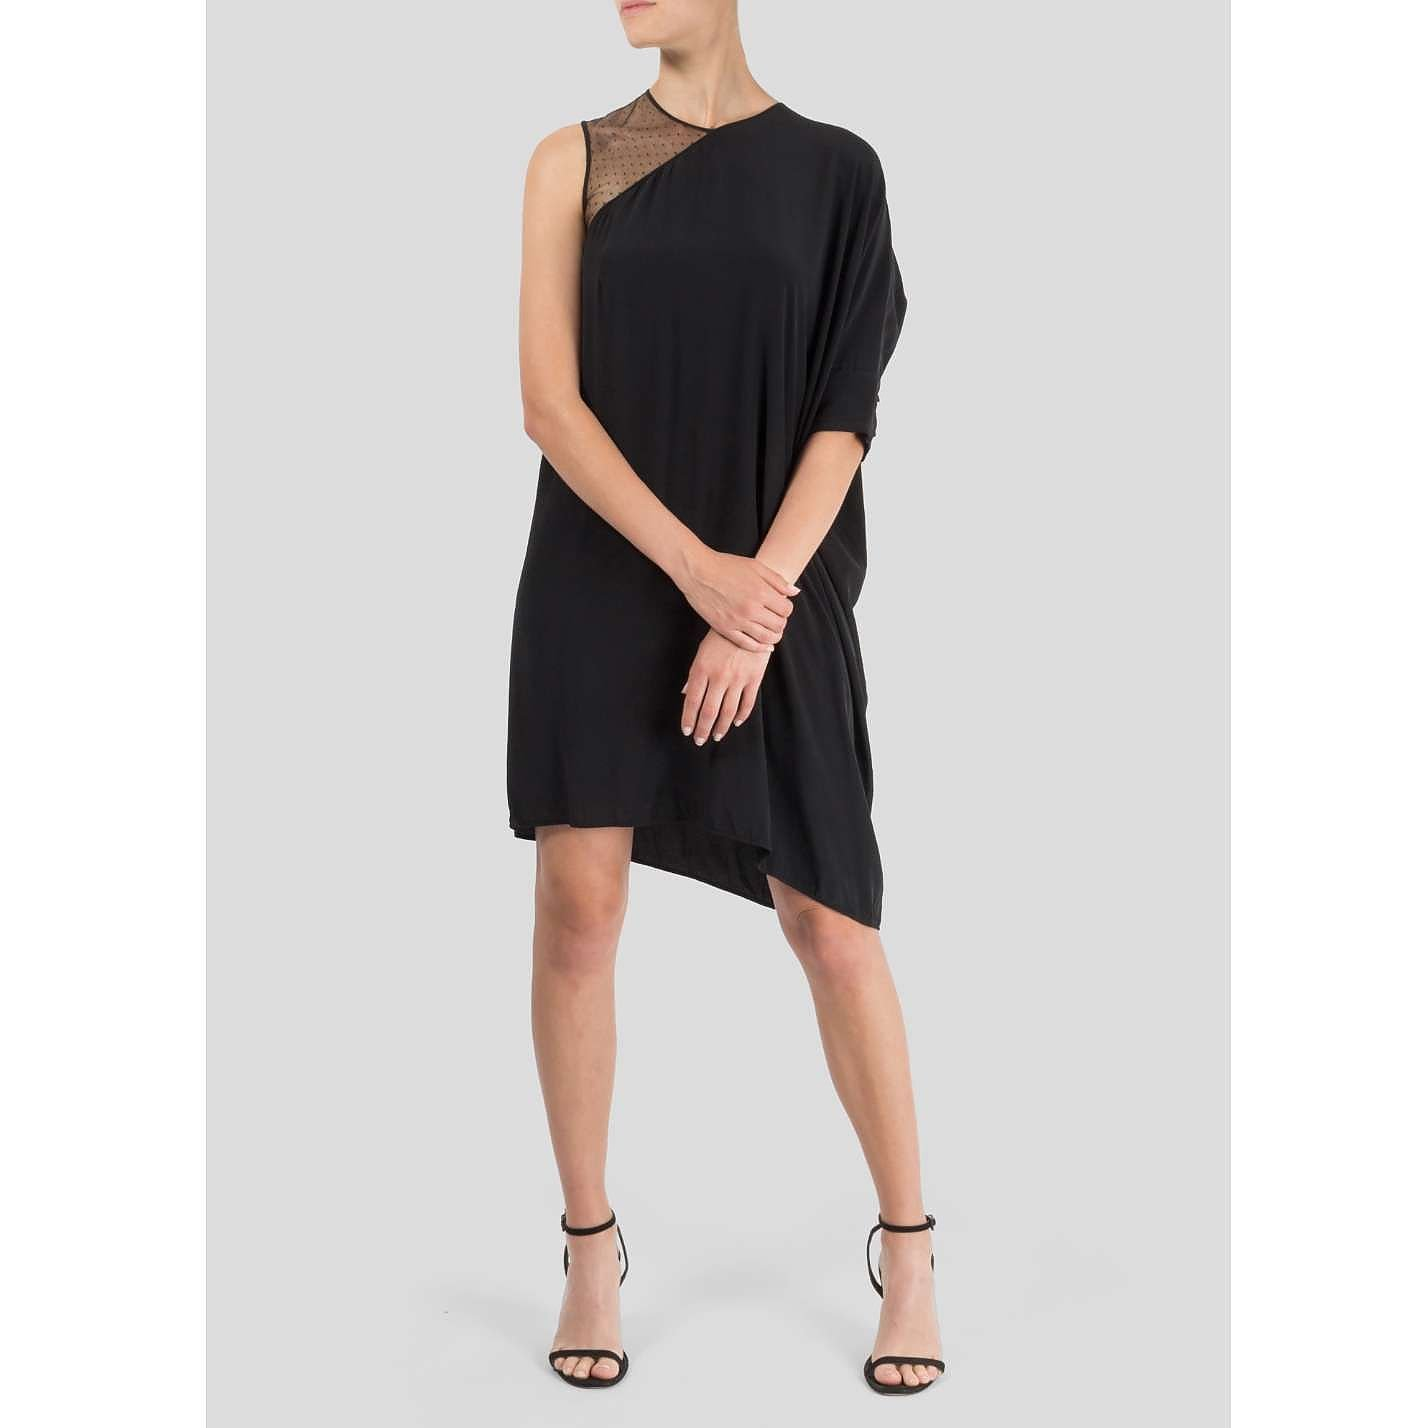 Richard Nicoll Asymmetric Dress